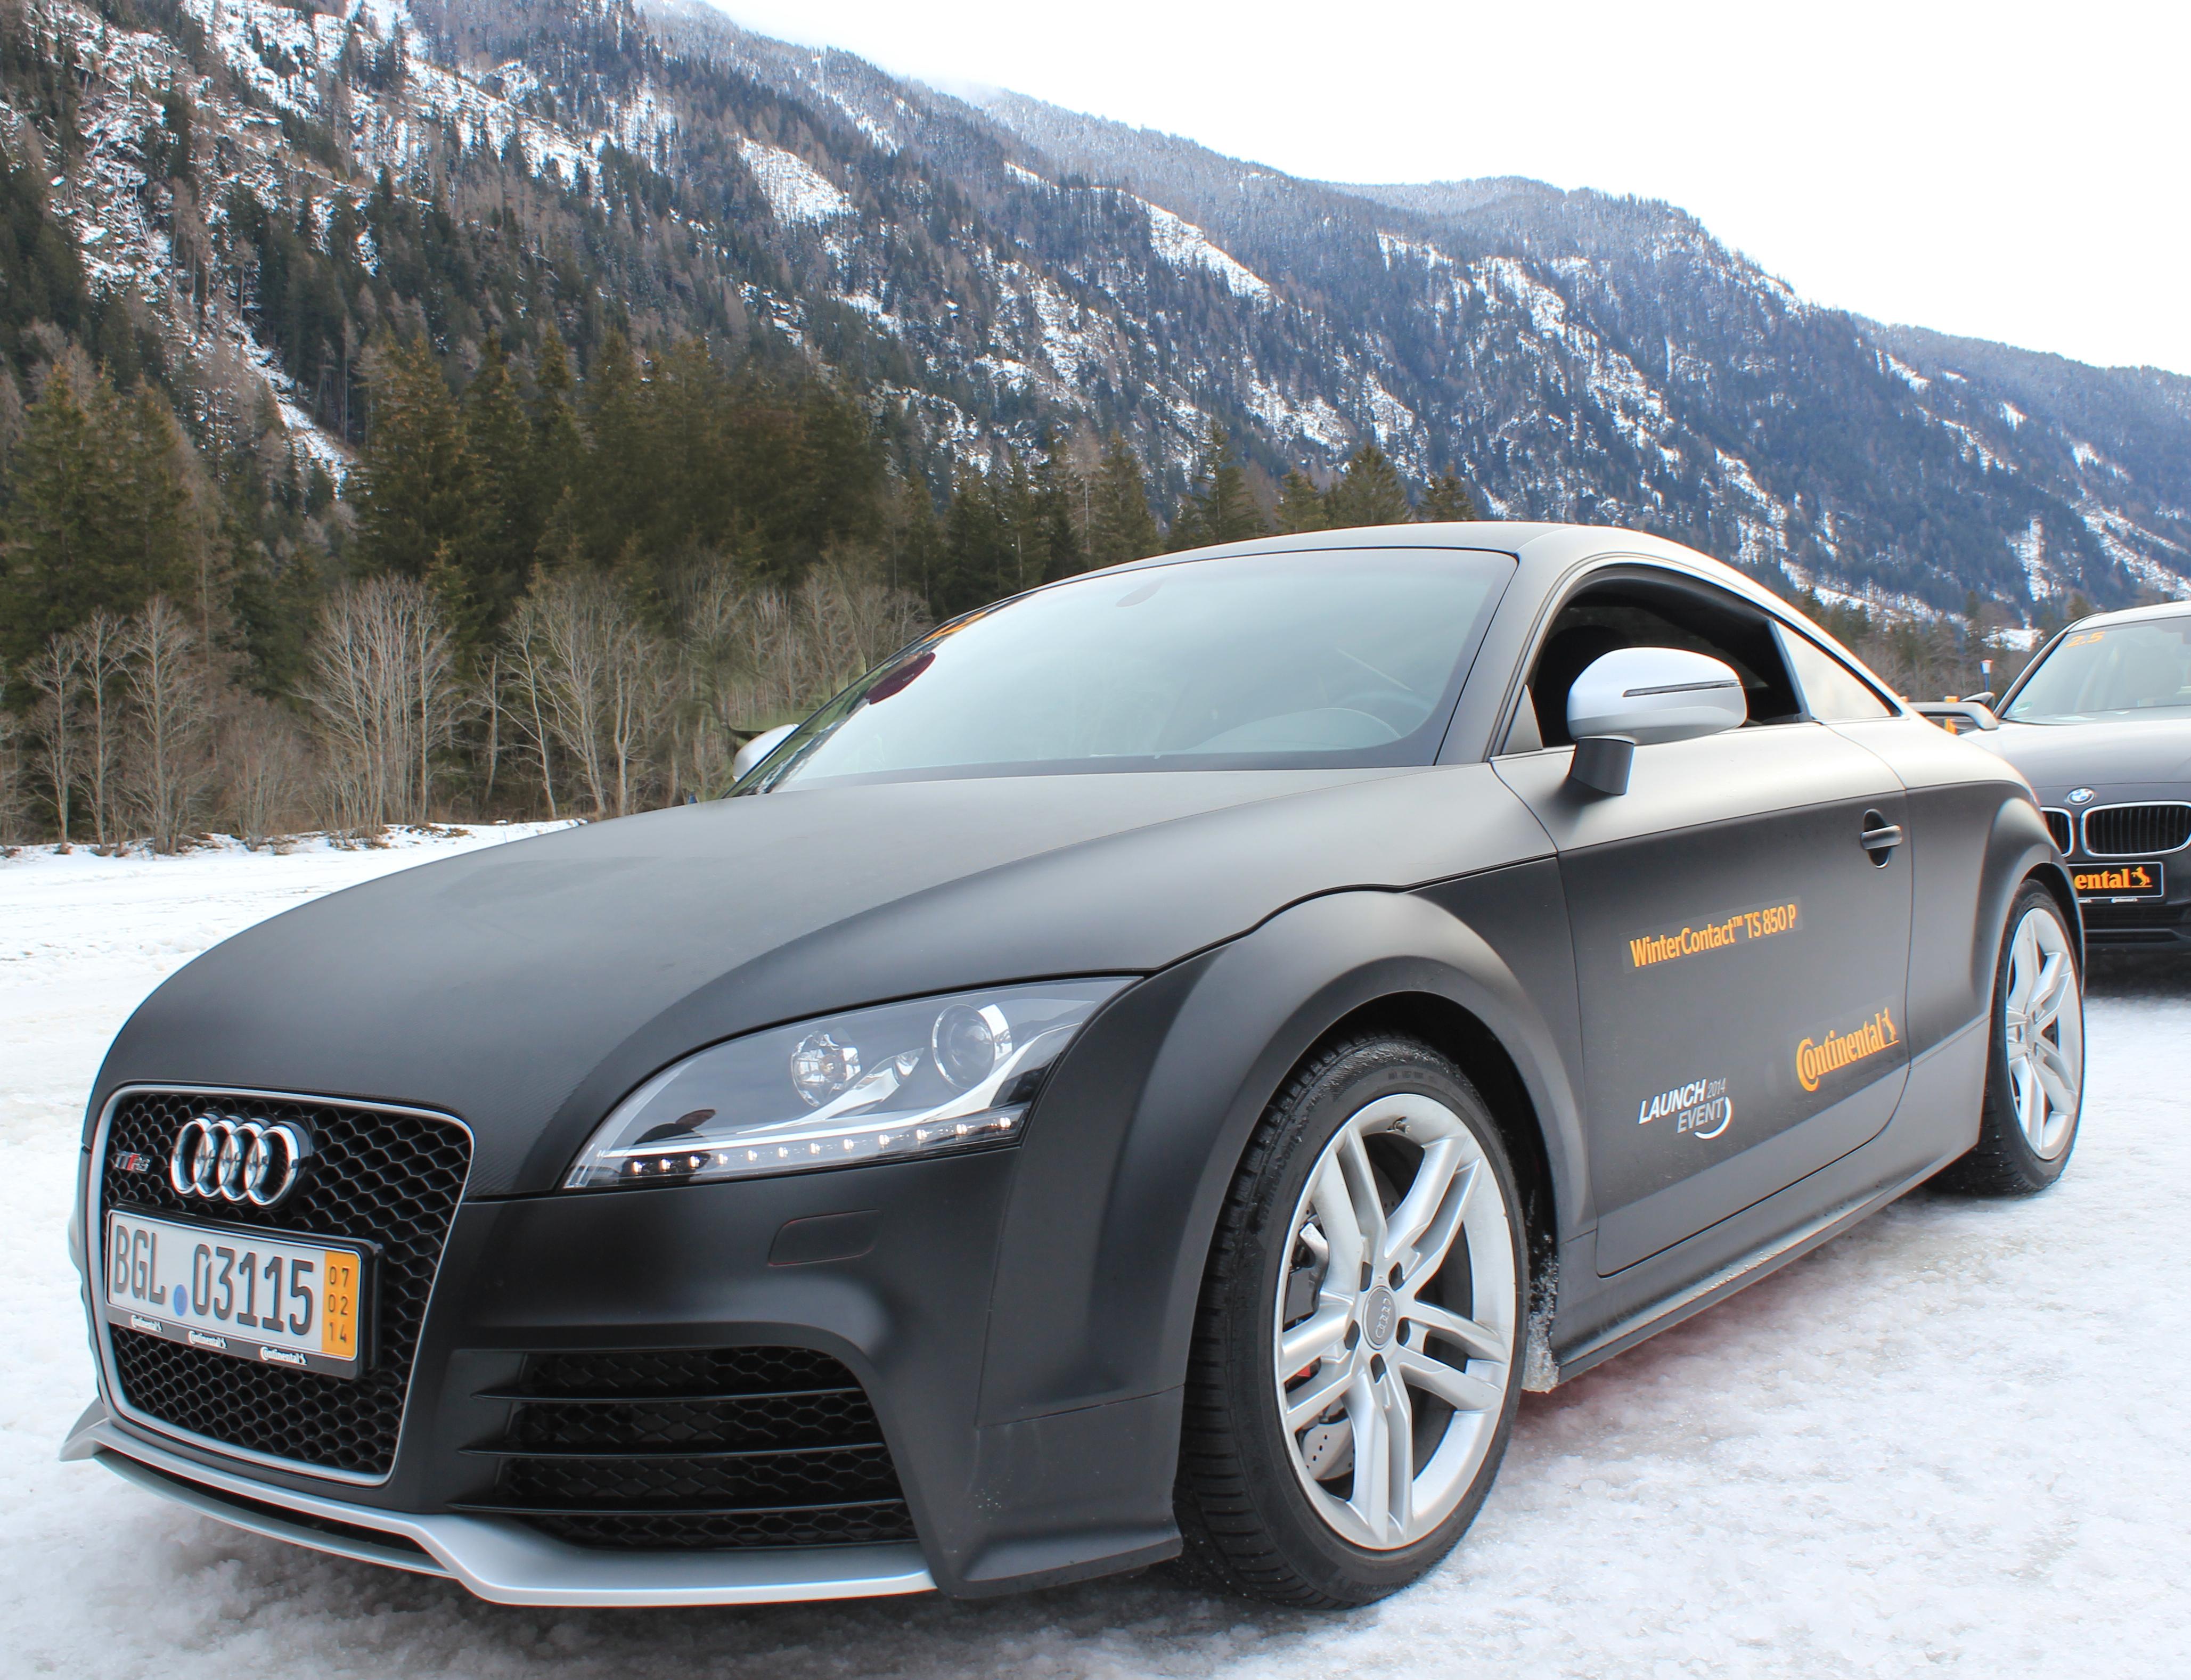 Matt black Audi TT